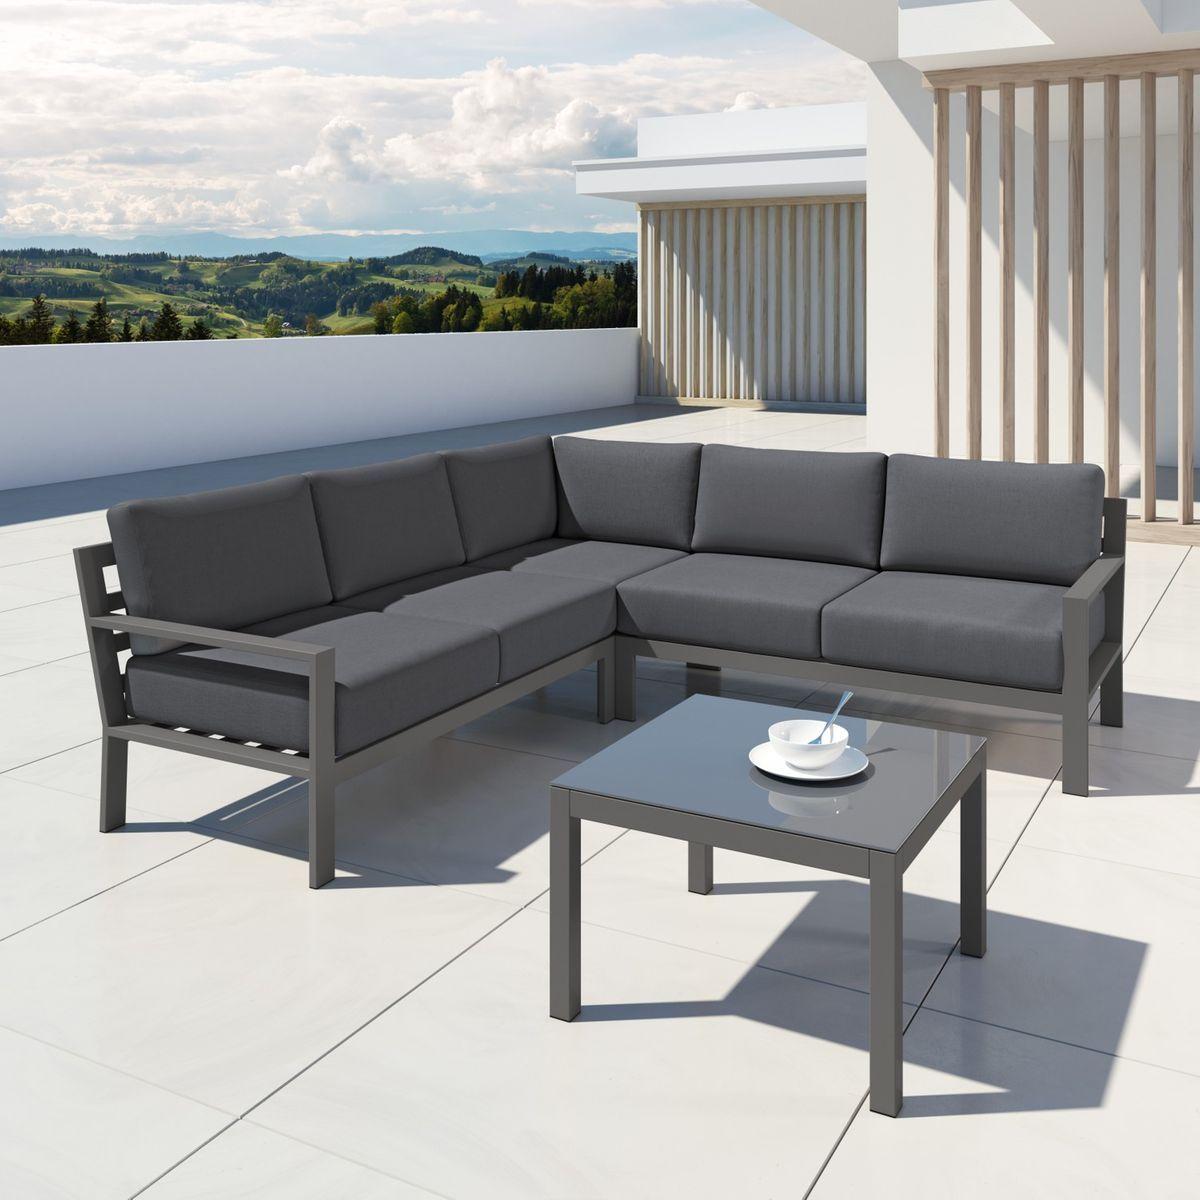 Salon de jardin aluminium design, MIO | Products | Ensemble ...